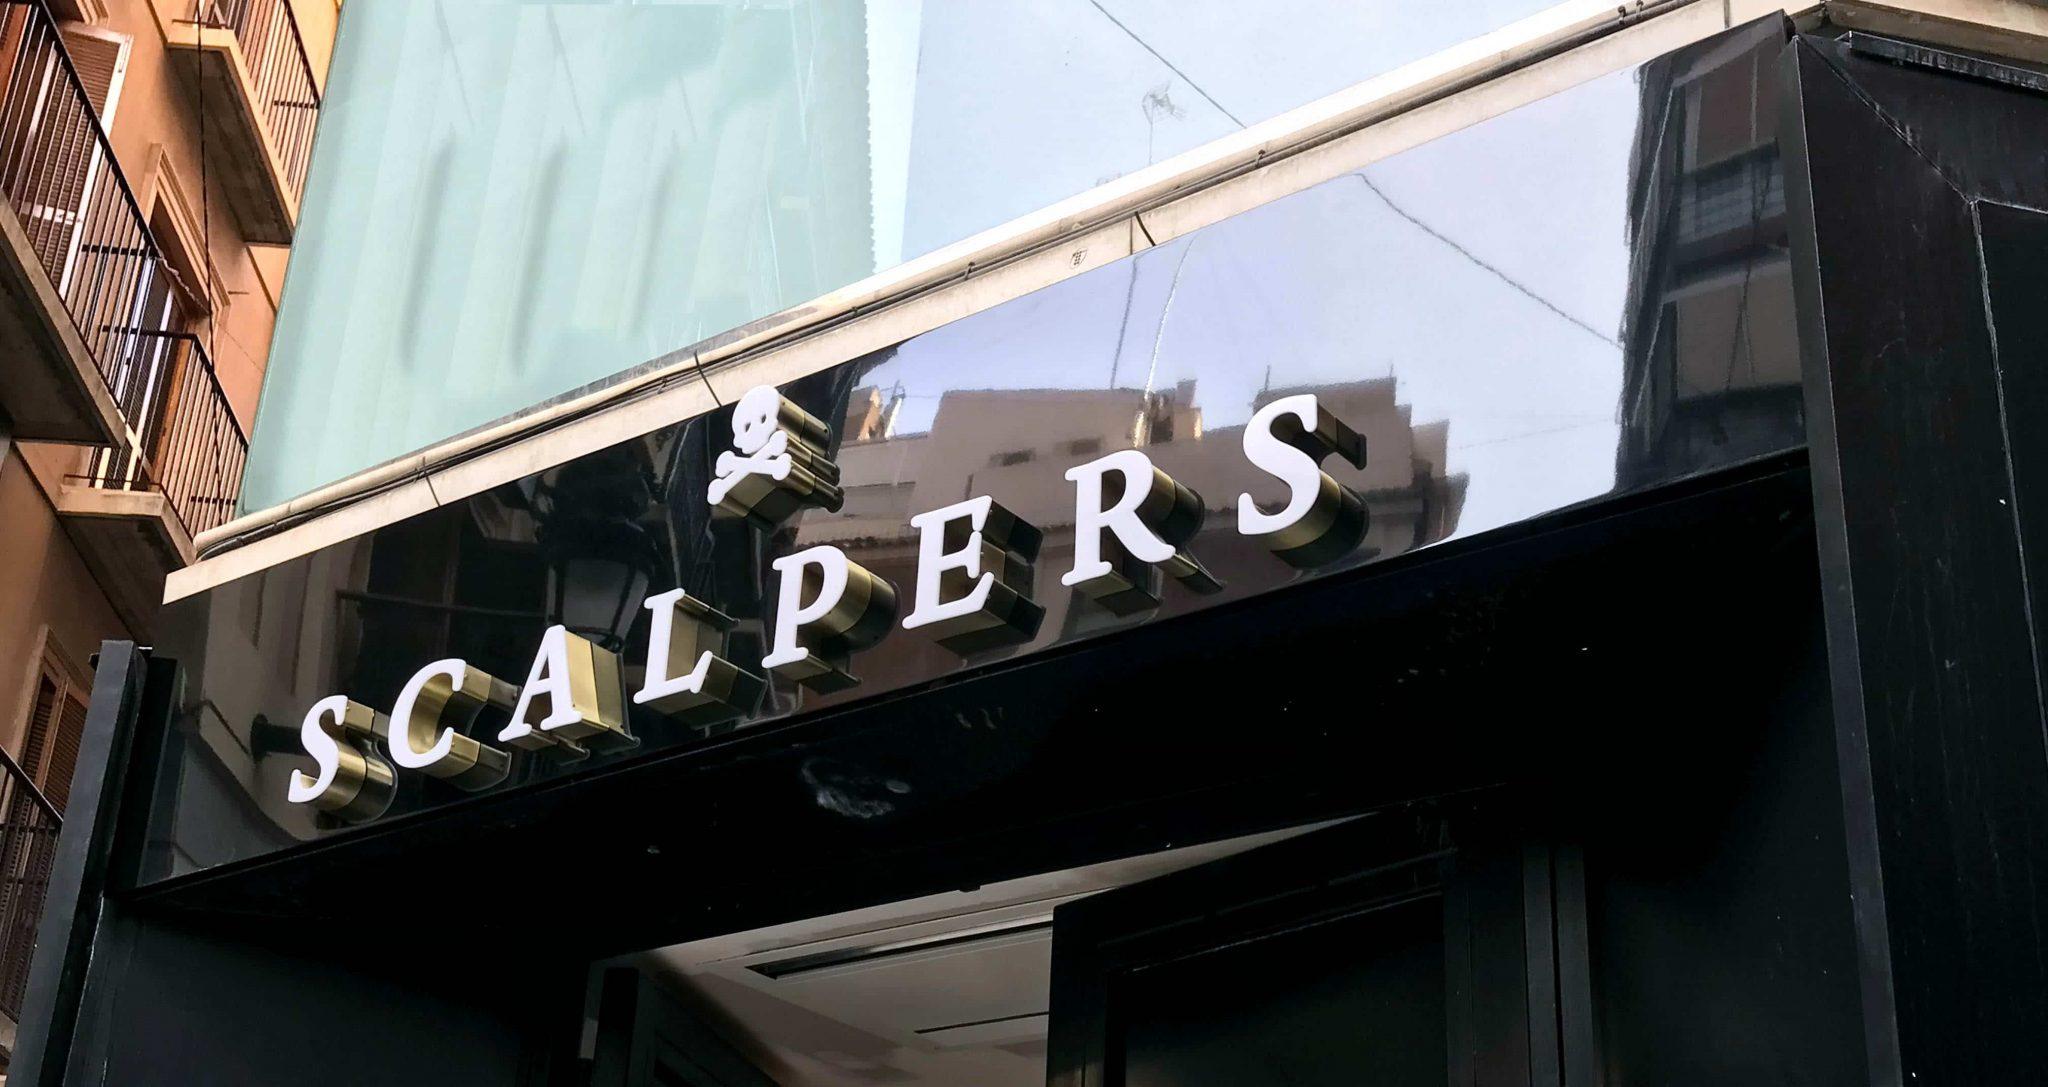 Scalpers - Corpóreas Aluminio - Rótulos Art Design